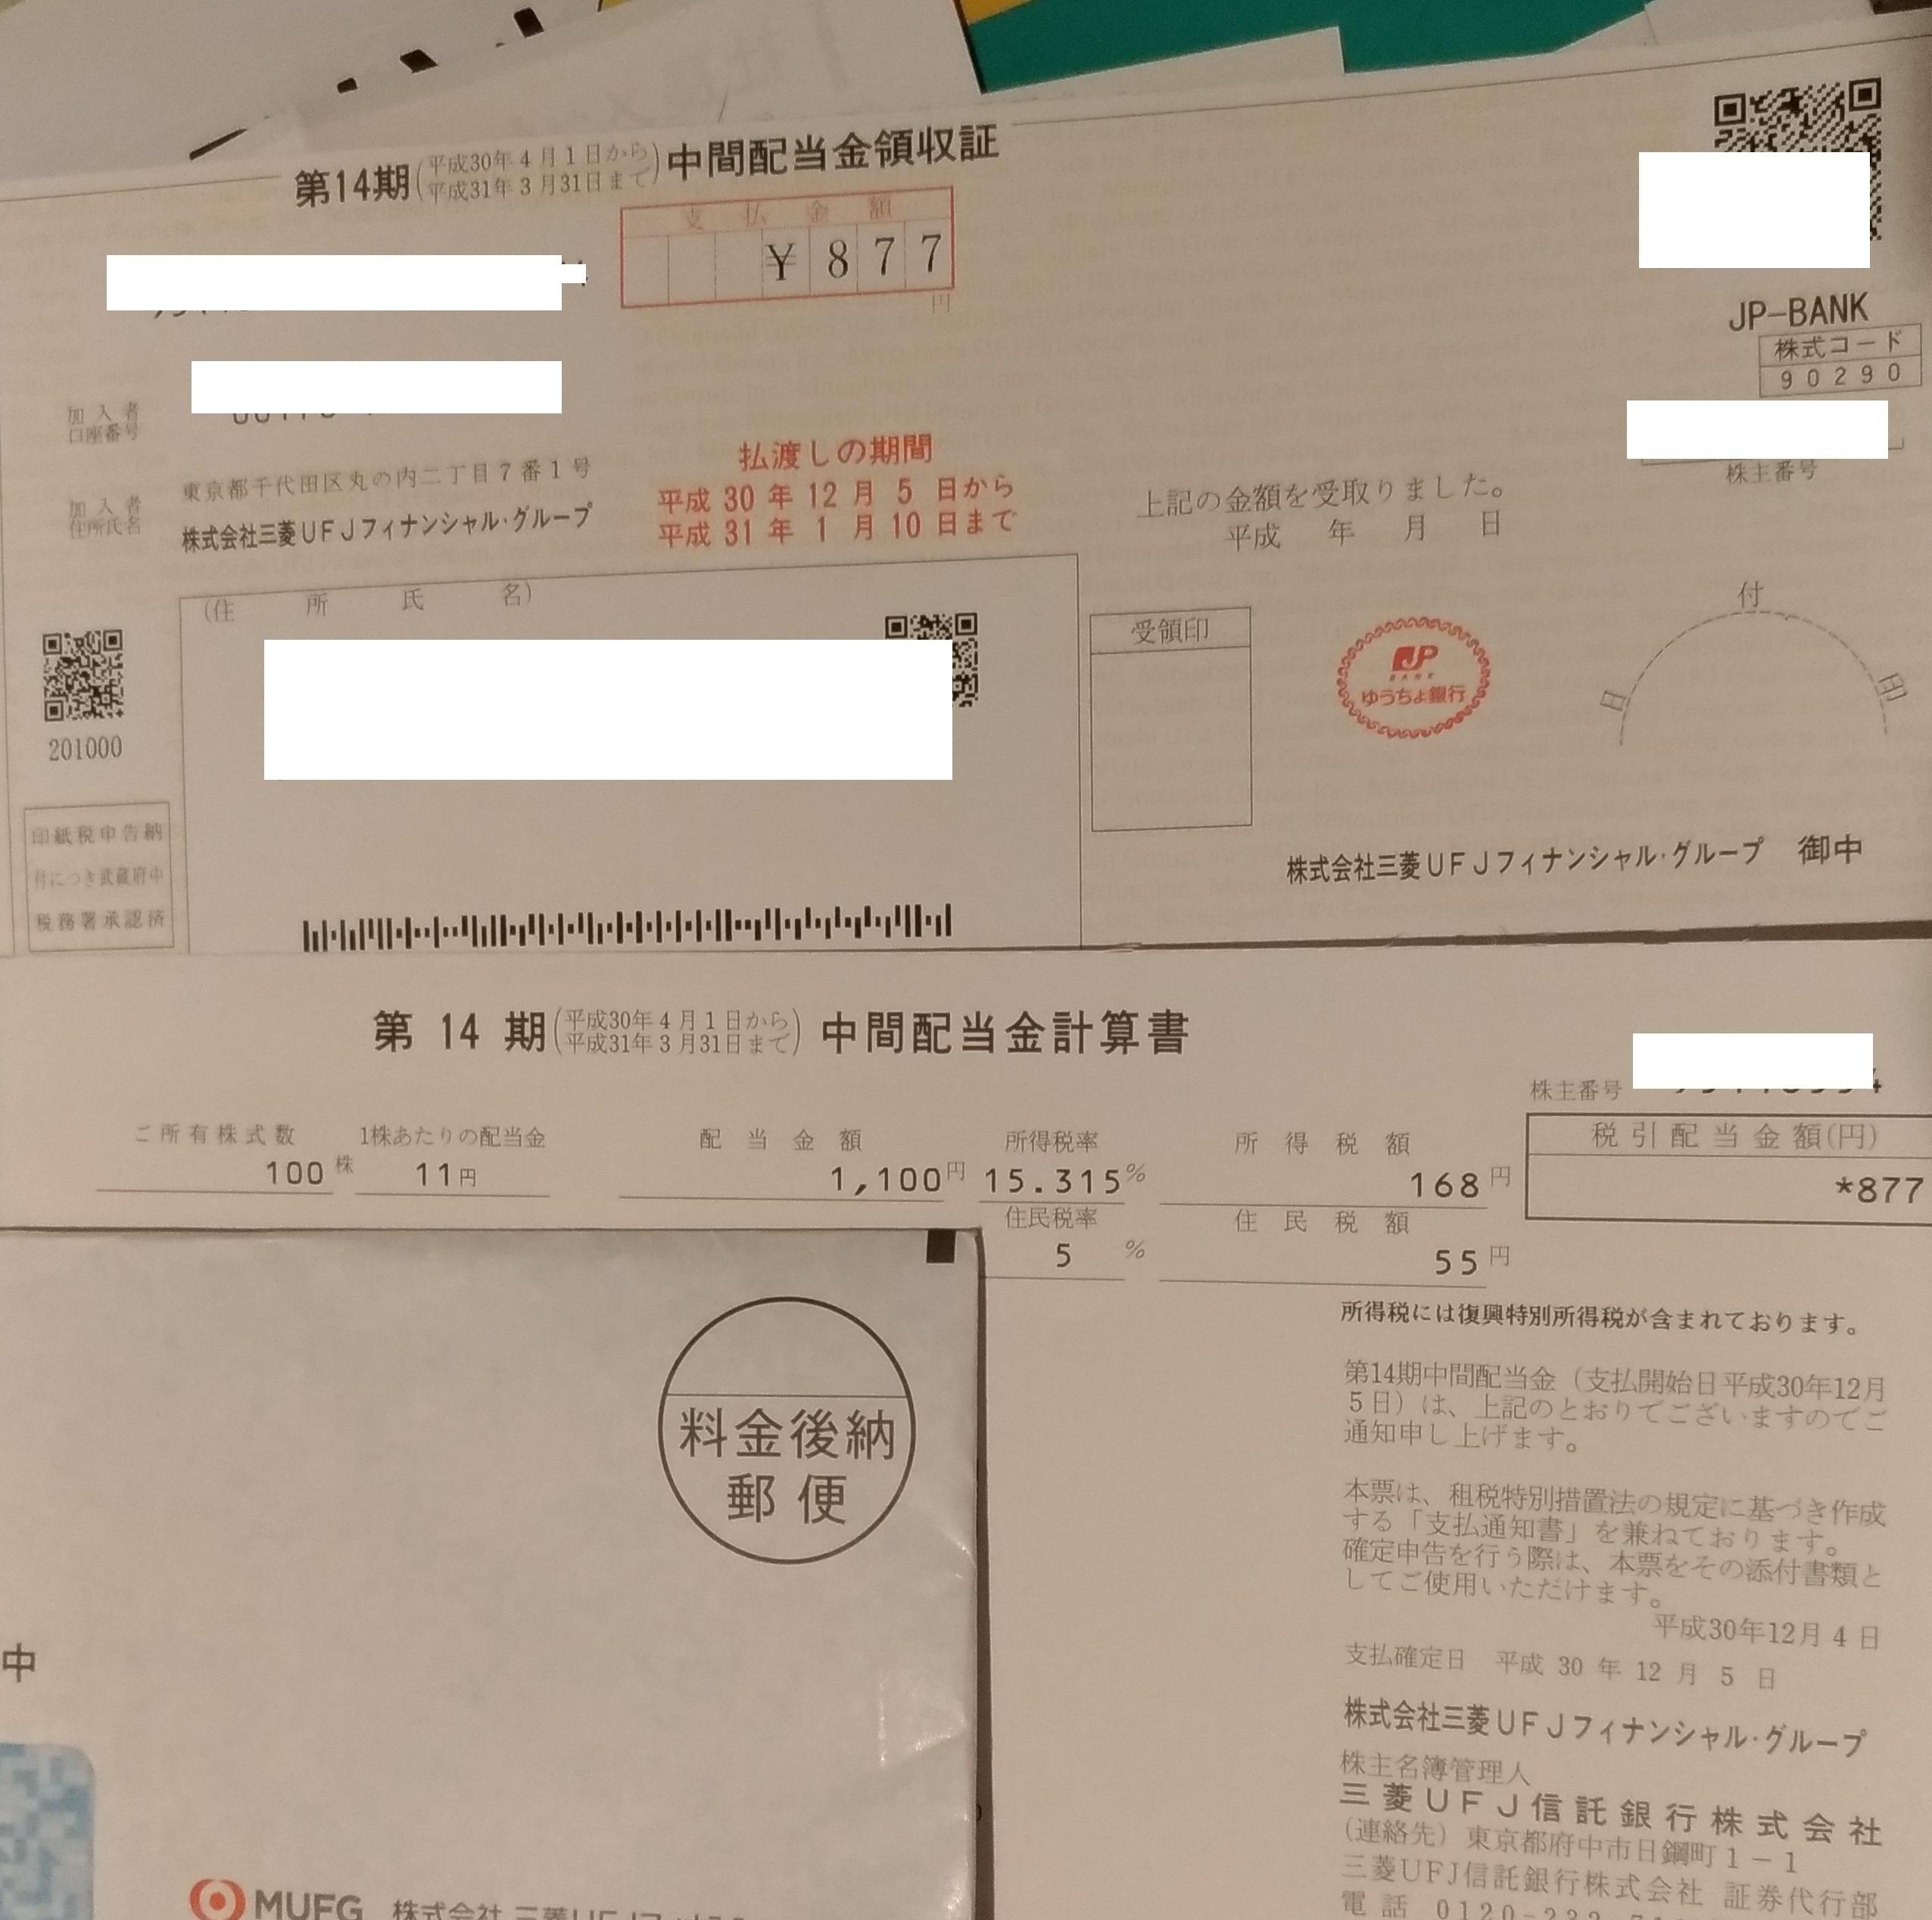 mitsubishi_ufj_haito_hitokabu.jpg